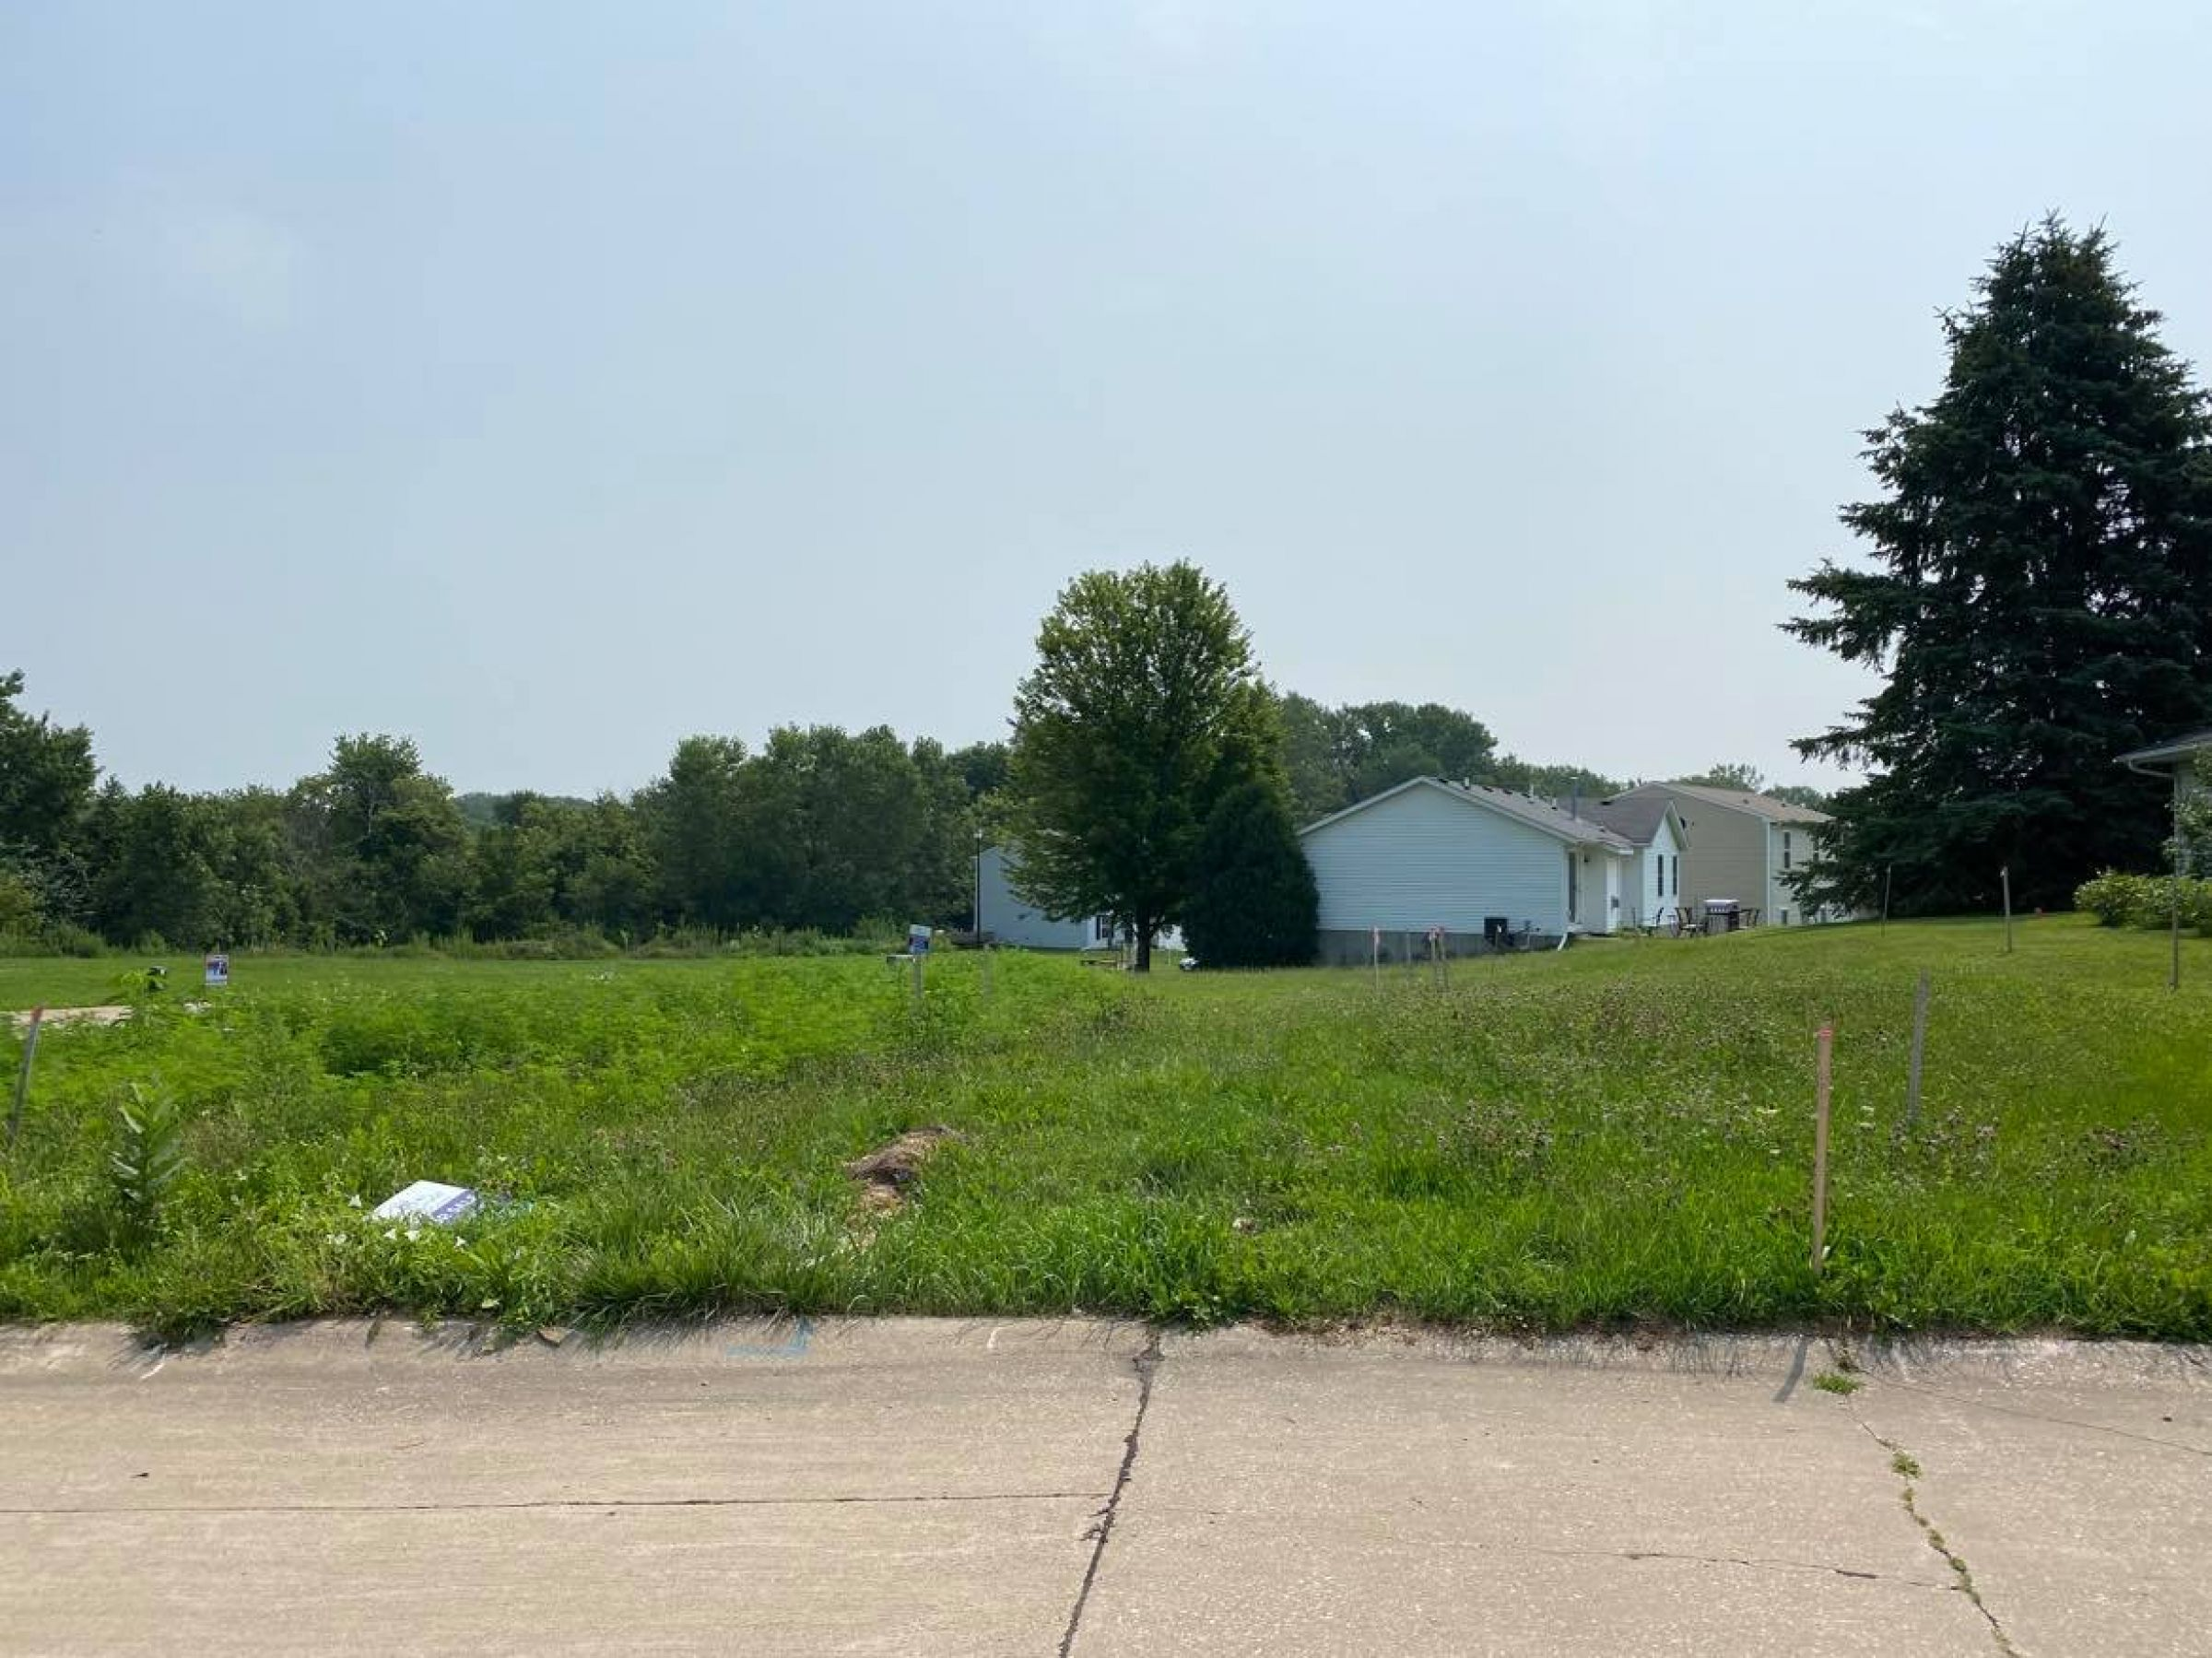 development-land-scott-county-iowa-0-acres-listing-number-15767-8-2021-09-22-040118.jpg